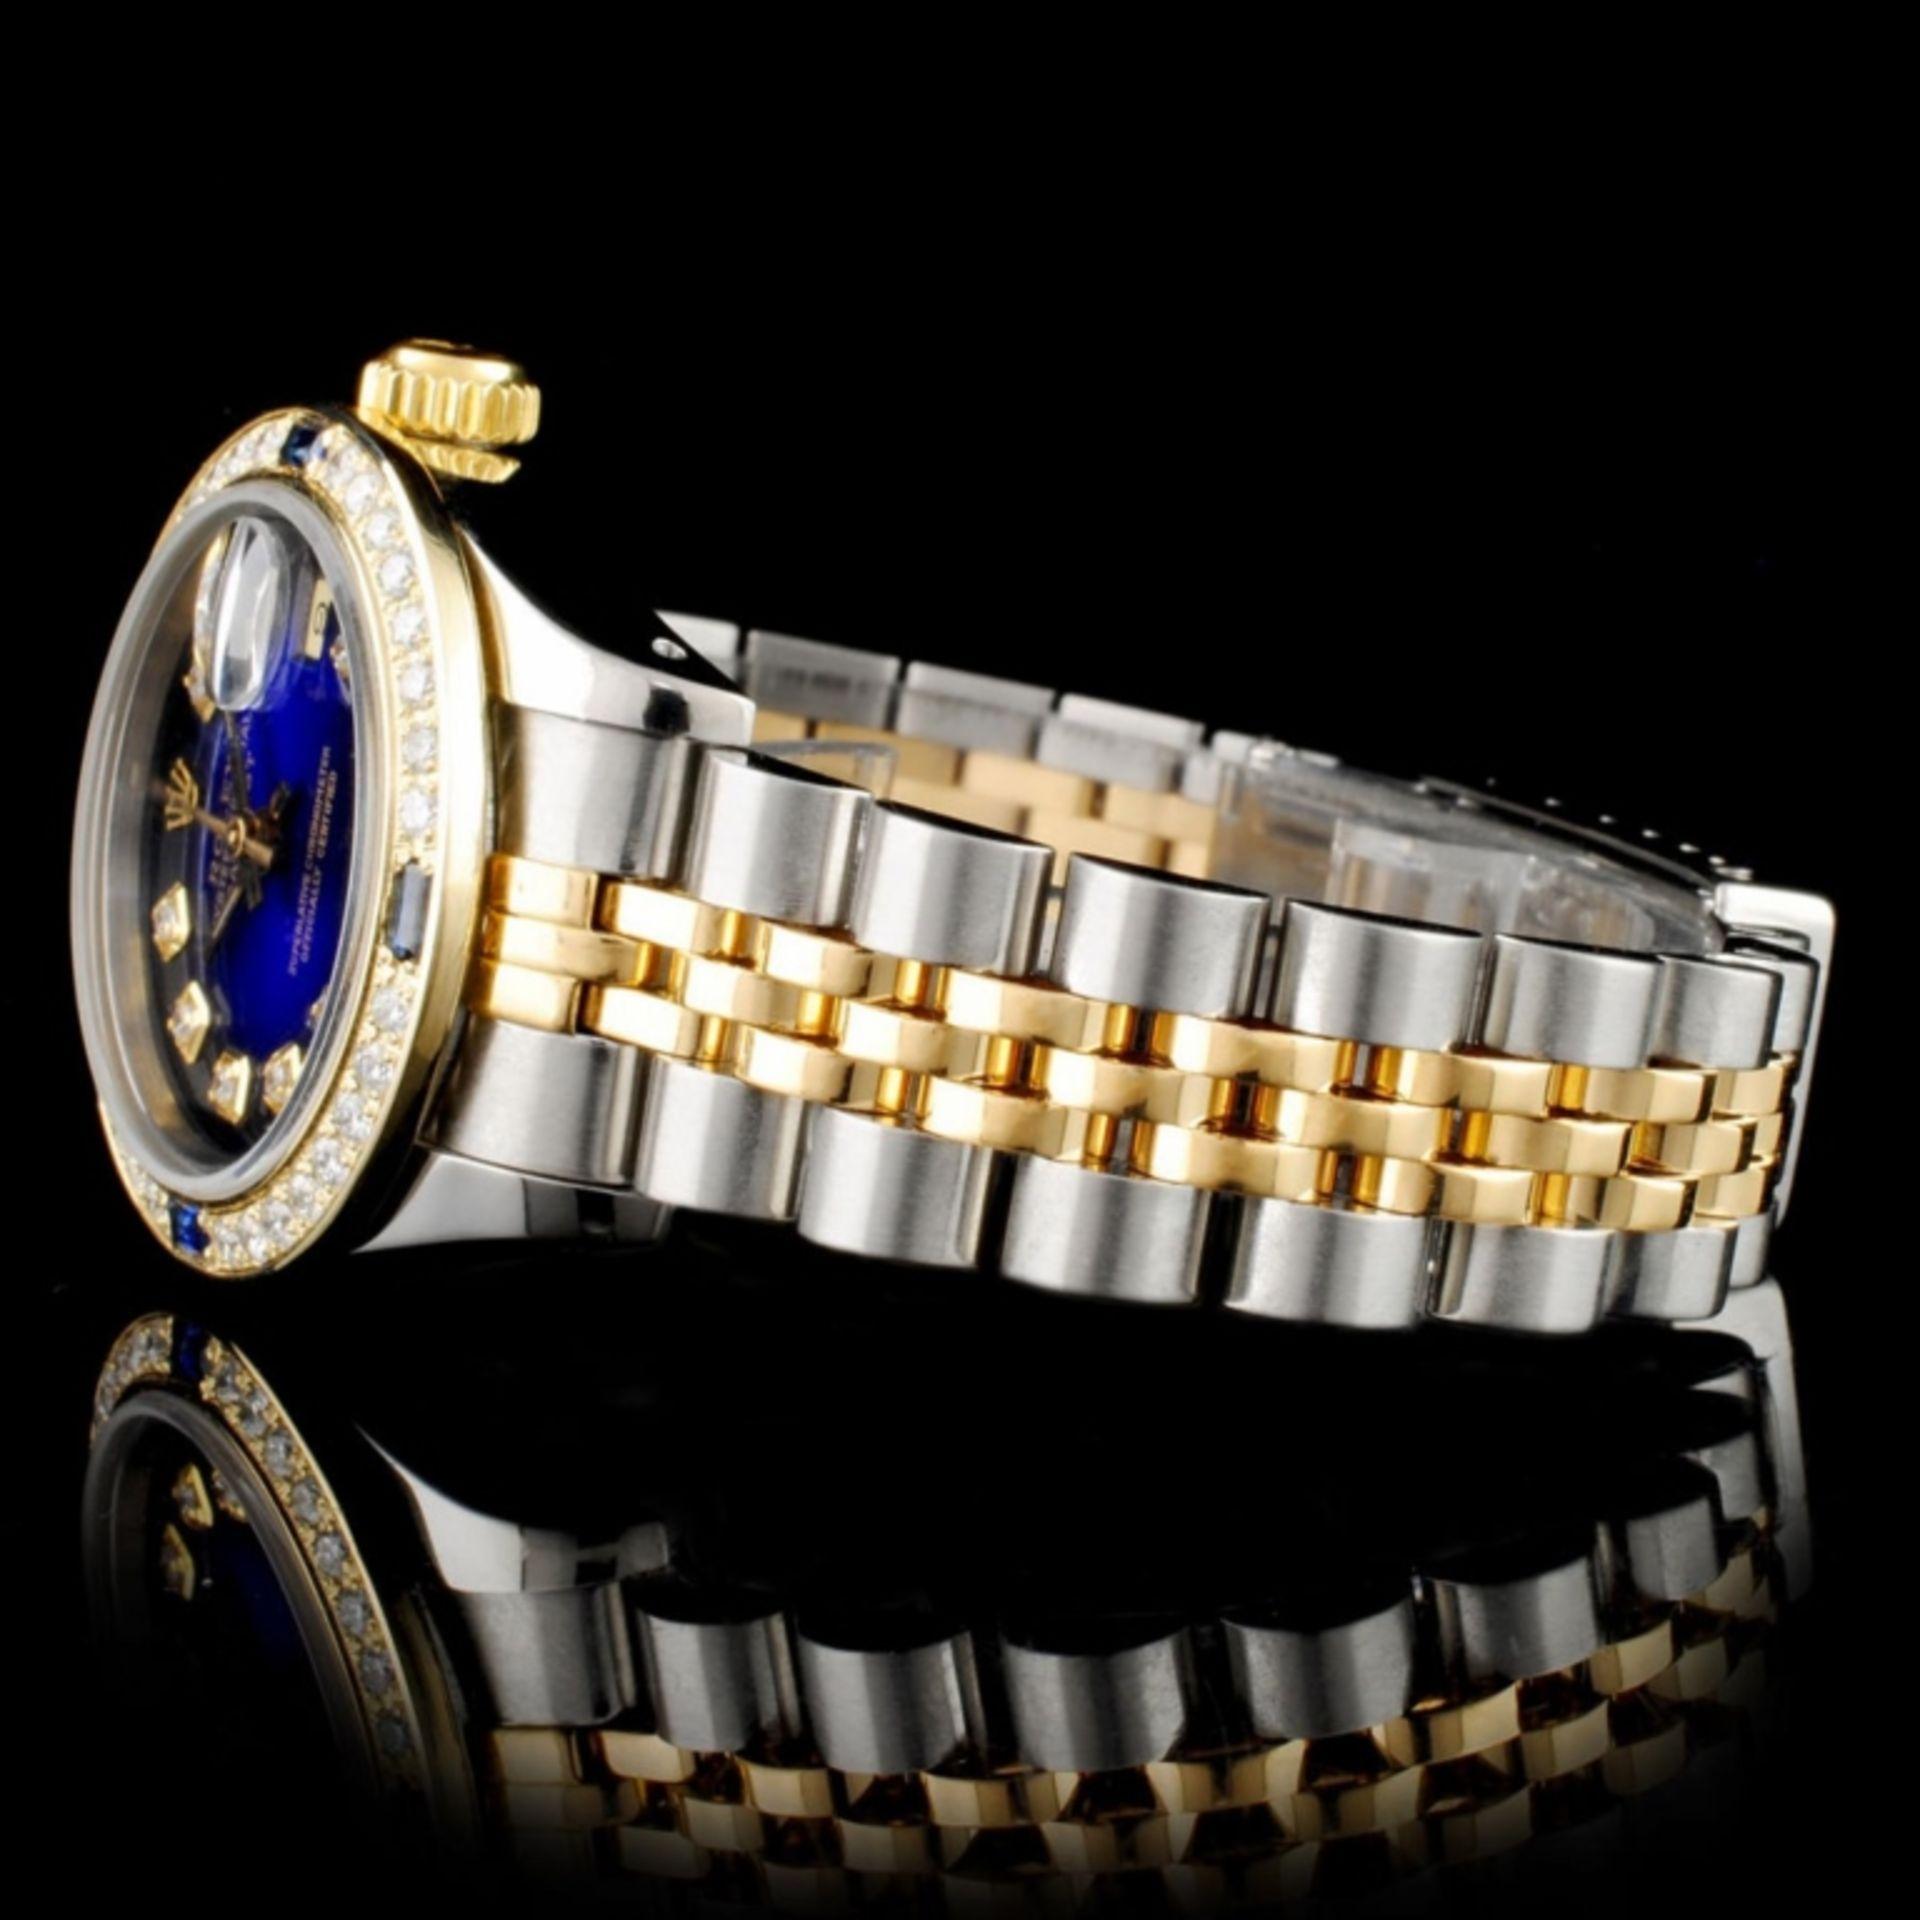 Rolex DateJust 18K & SS 1.00ct Diamond Blue Vignet - Image 6 of 8